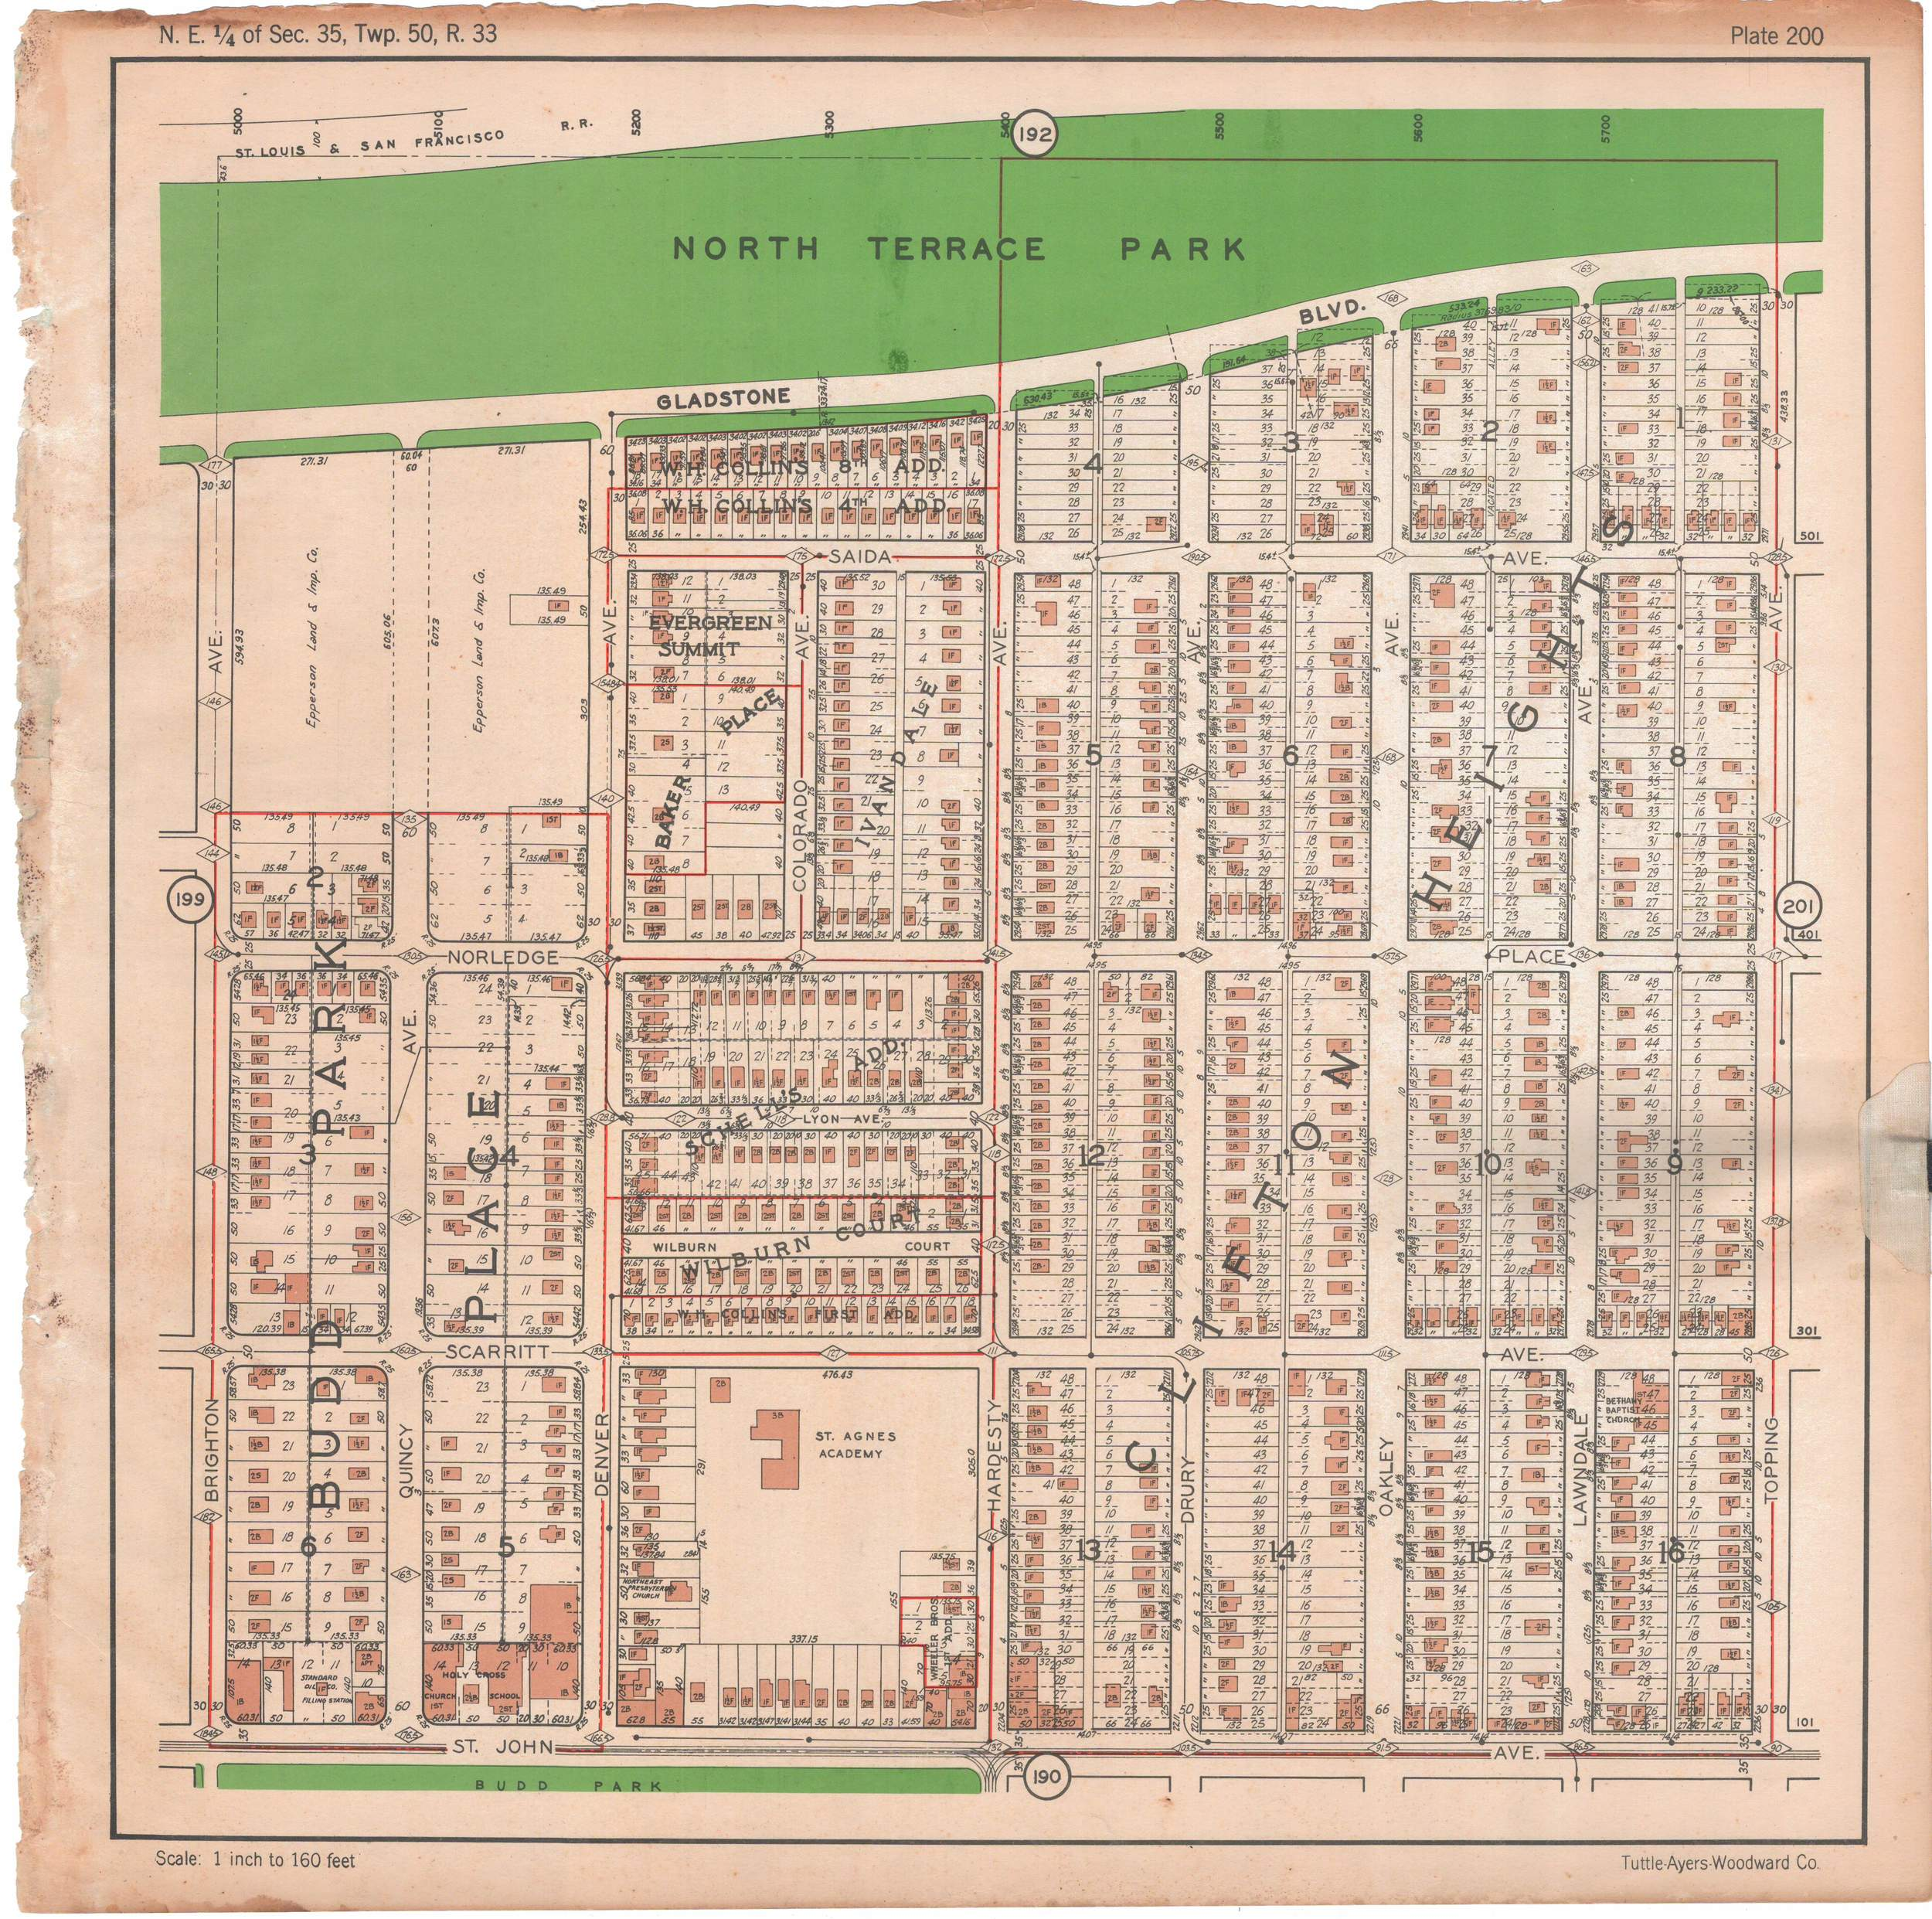 1925 TUTTLE_AYERS_Plate_200.JPG